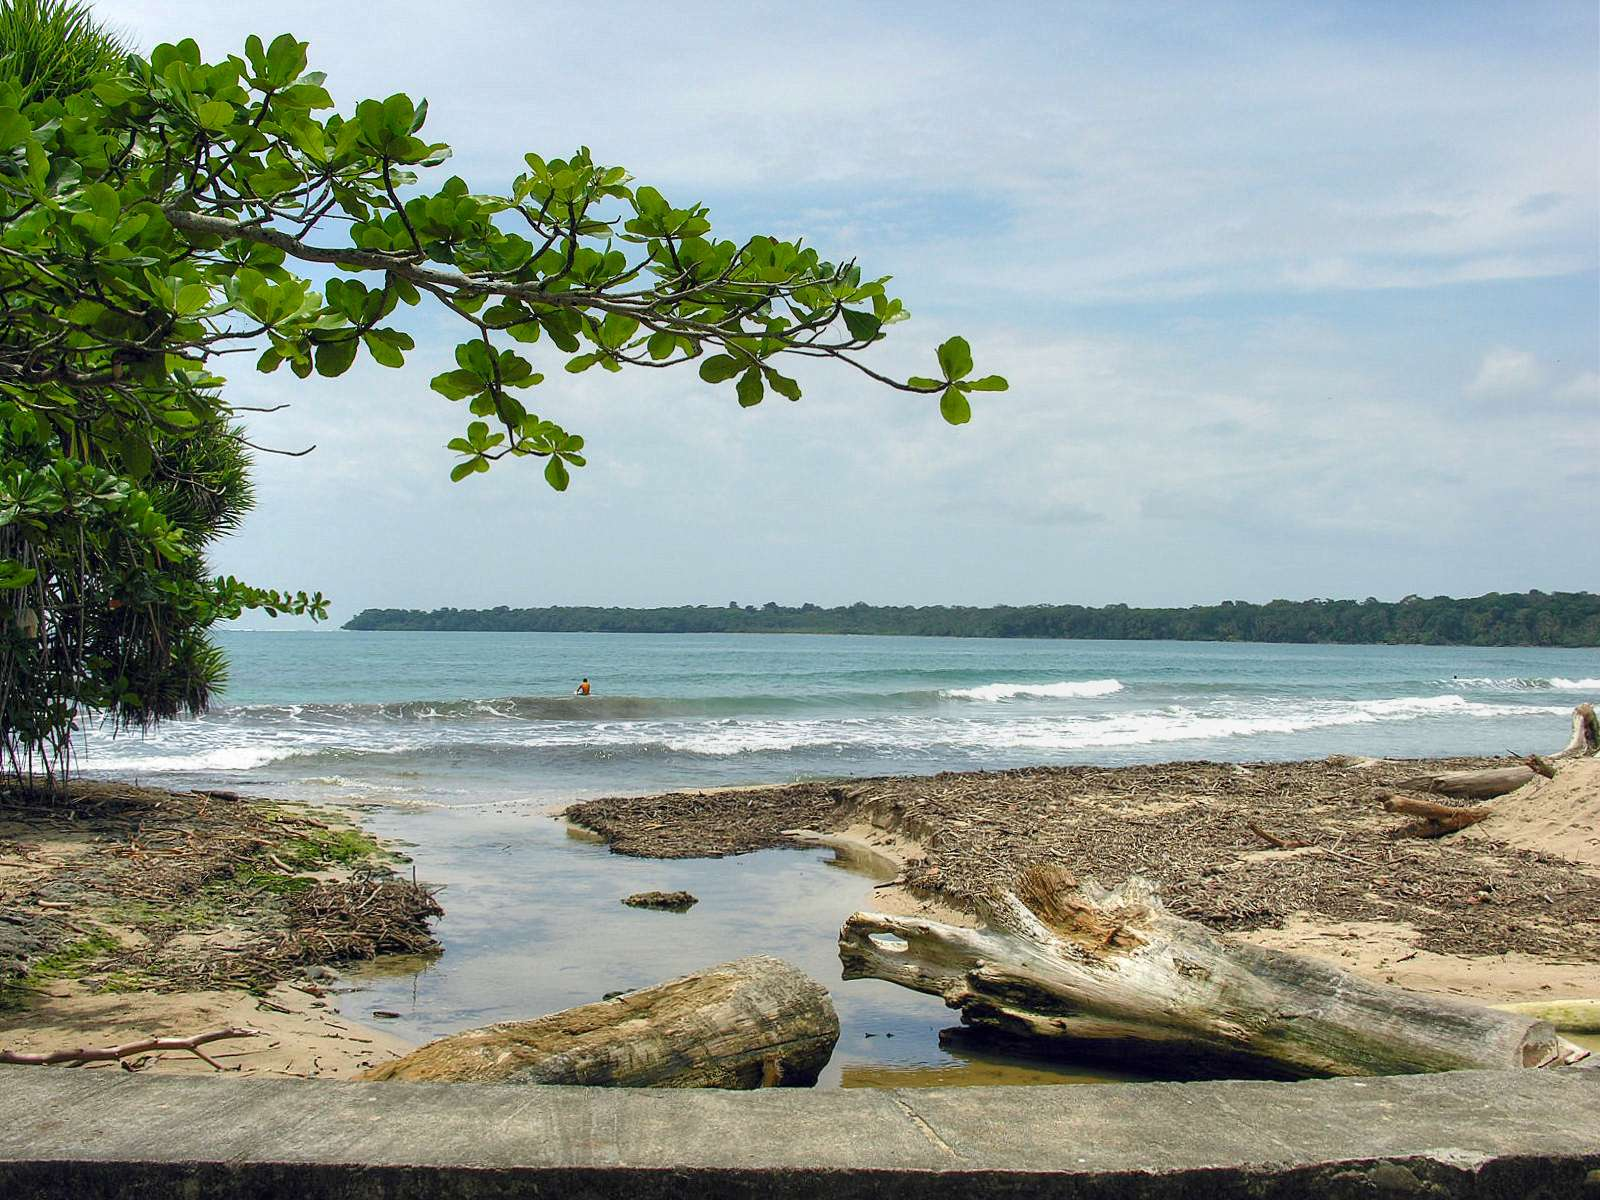 Playa Blanco, ubicada dentro del Parque Nacional Cahuita Cahuita Costa Rica